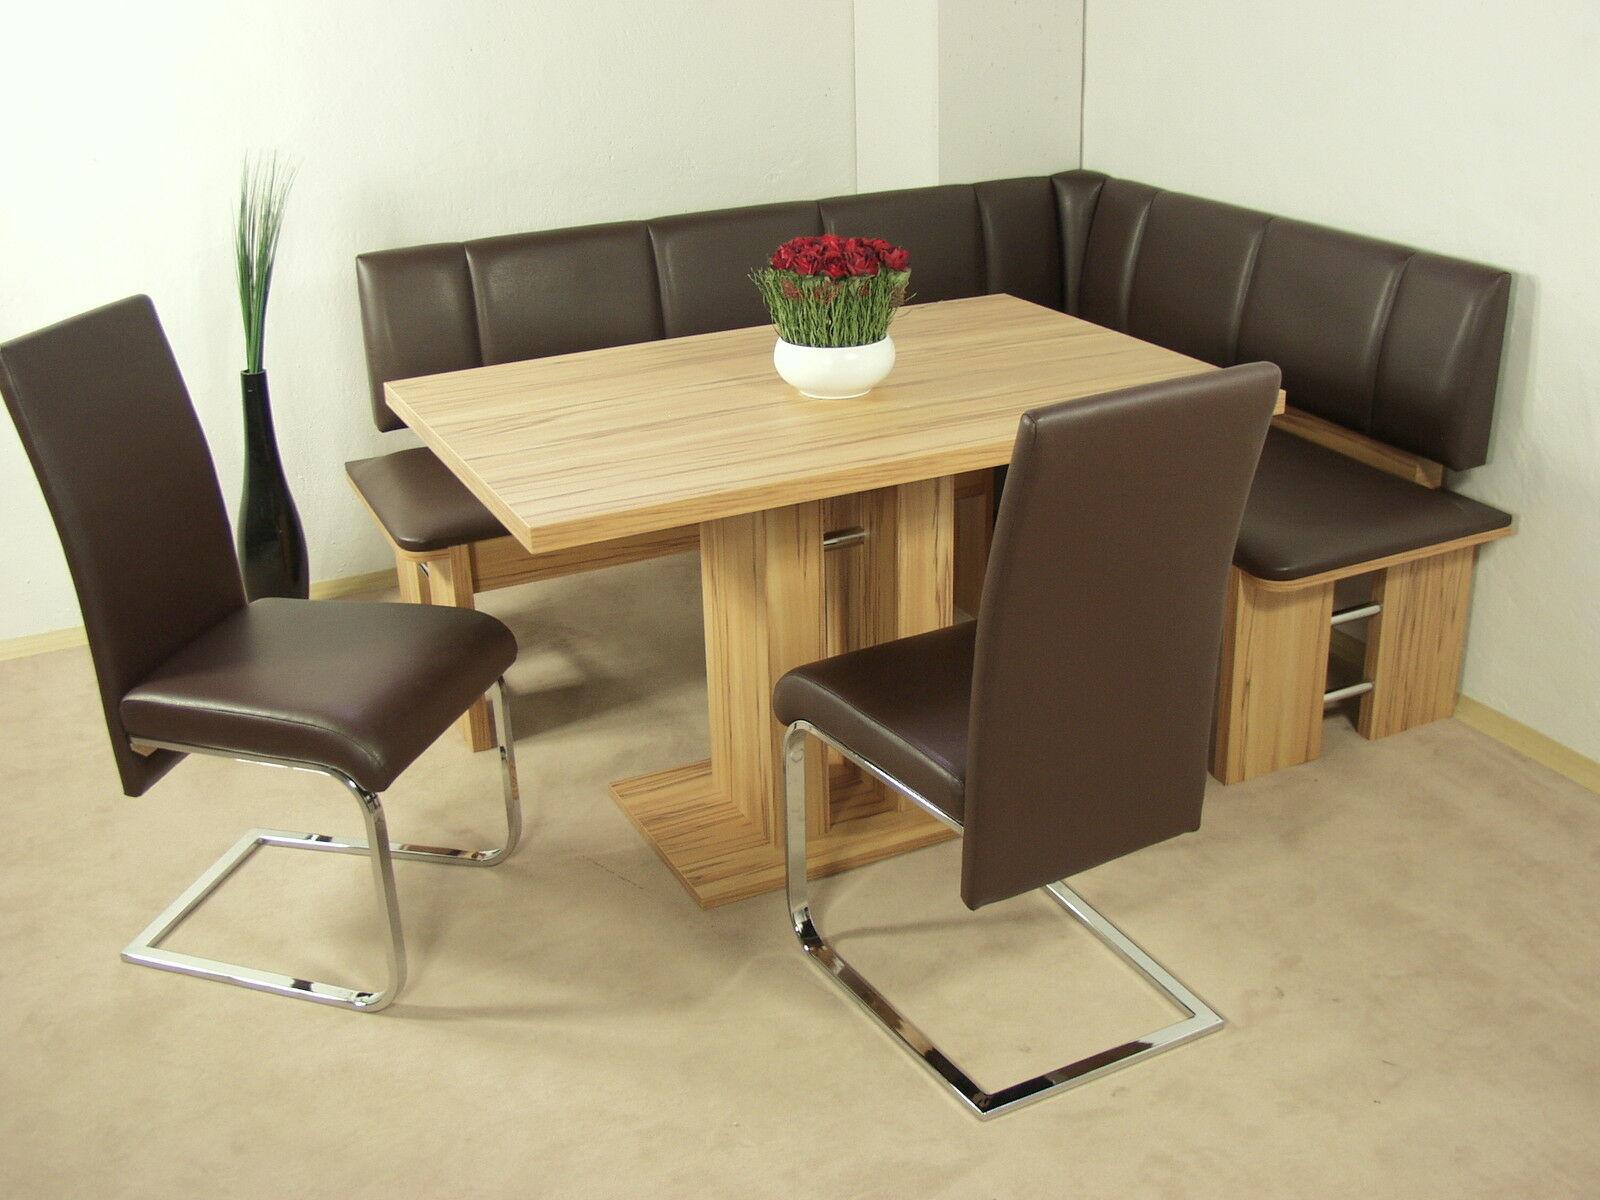 Attraktiv Moderne Eckbank Ideen Von Eckbankgruppe Kernbuche Stühle Tisch Stuhlset Dinninggruppe Design